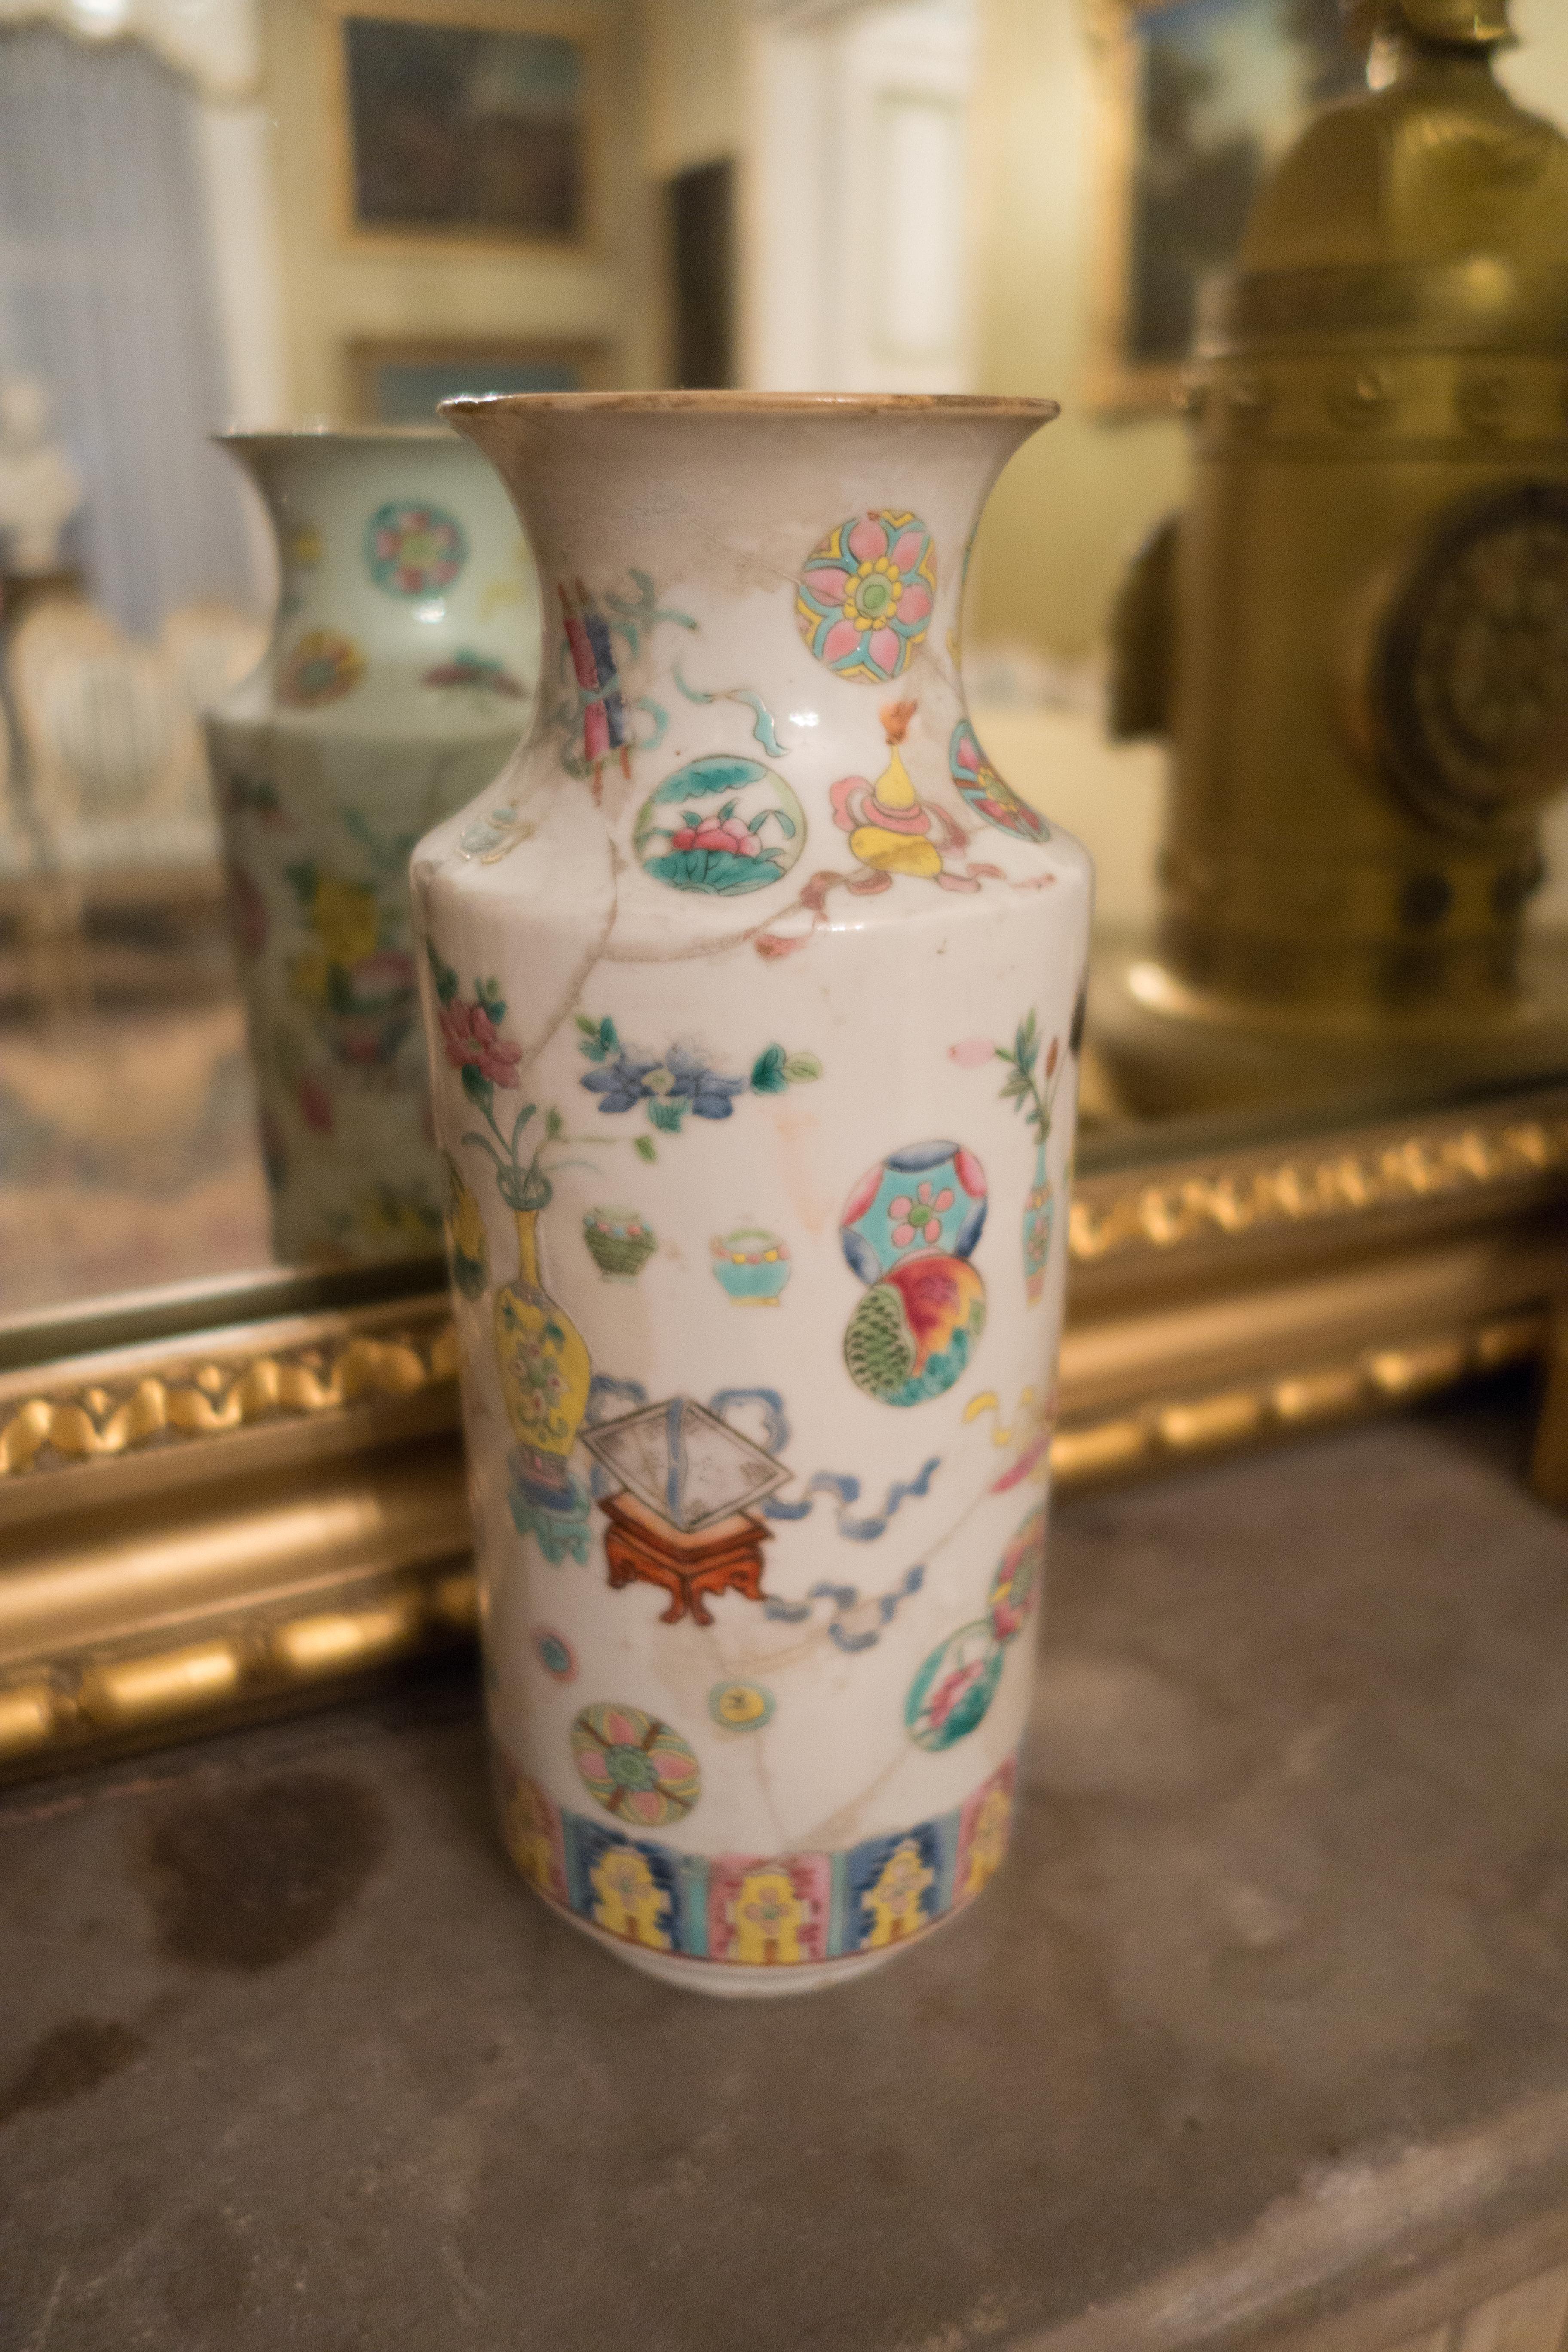 Filechinese antique vase 25681881723g wikimedia commons filechinese antique vase 25681881723g reviewsmspy